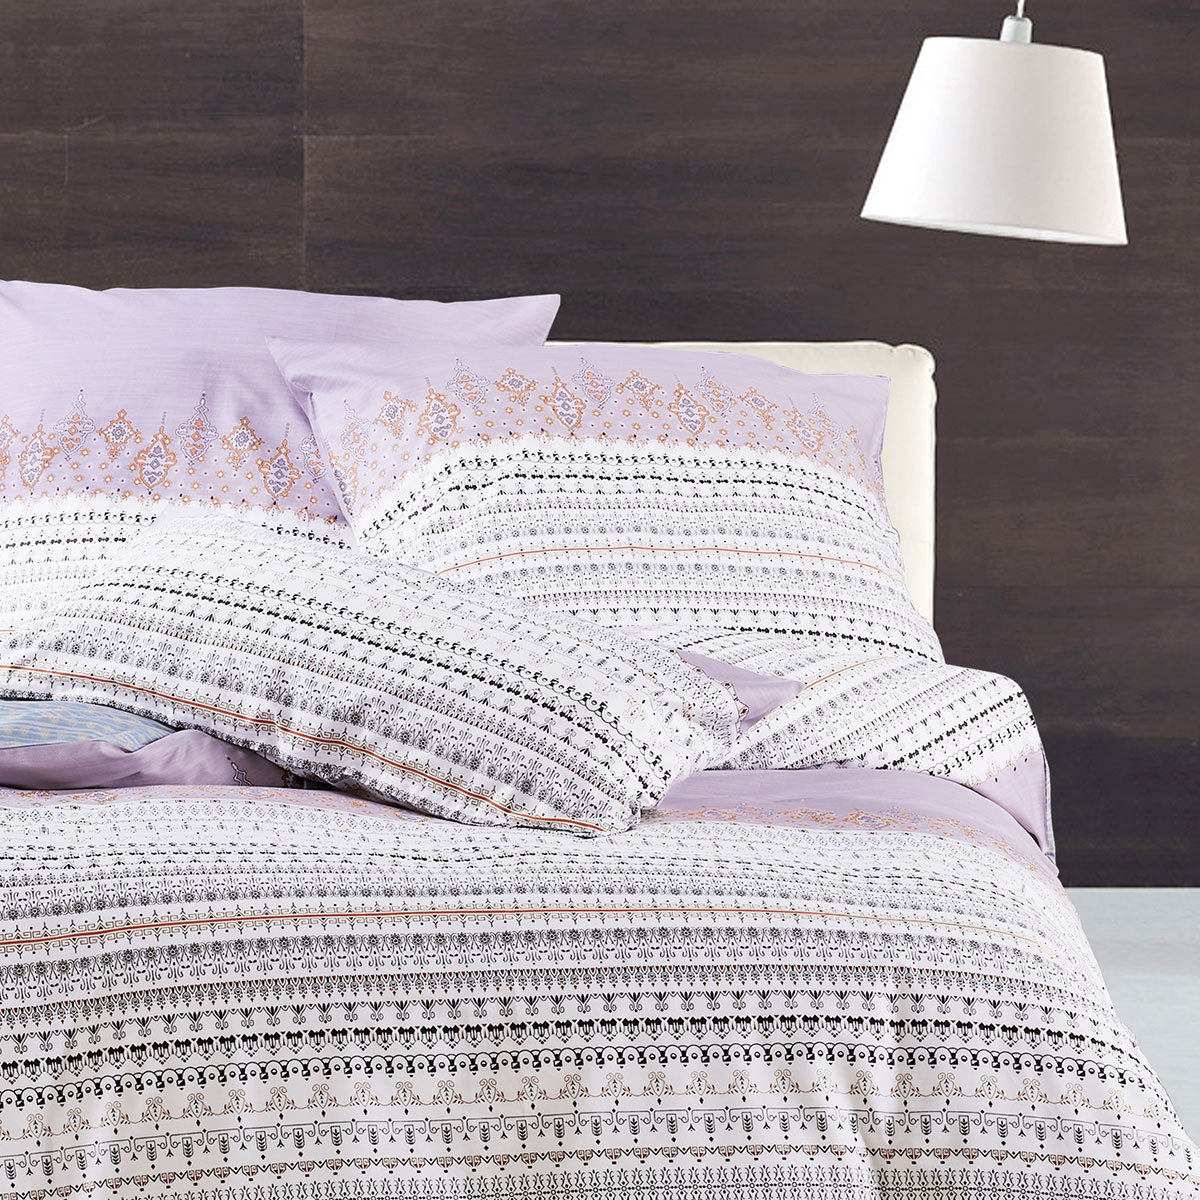 bettwarenshop renforc wendebettw sche luna g nstig online kaufen bei bettwaren shop. Black Bedroom Furniture Sets. Home Design Ideas